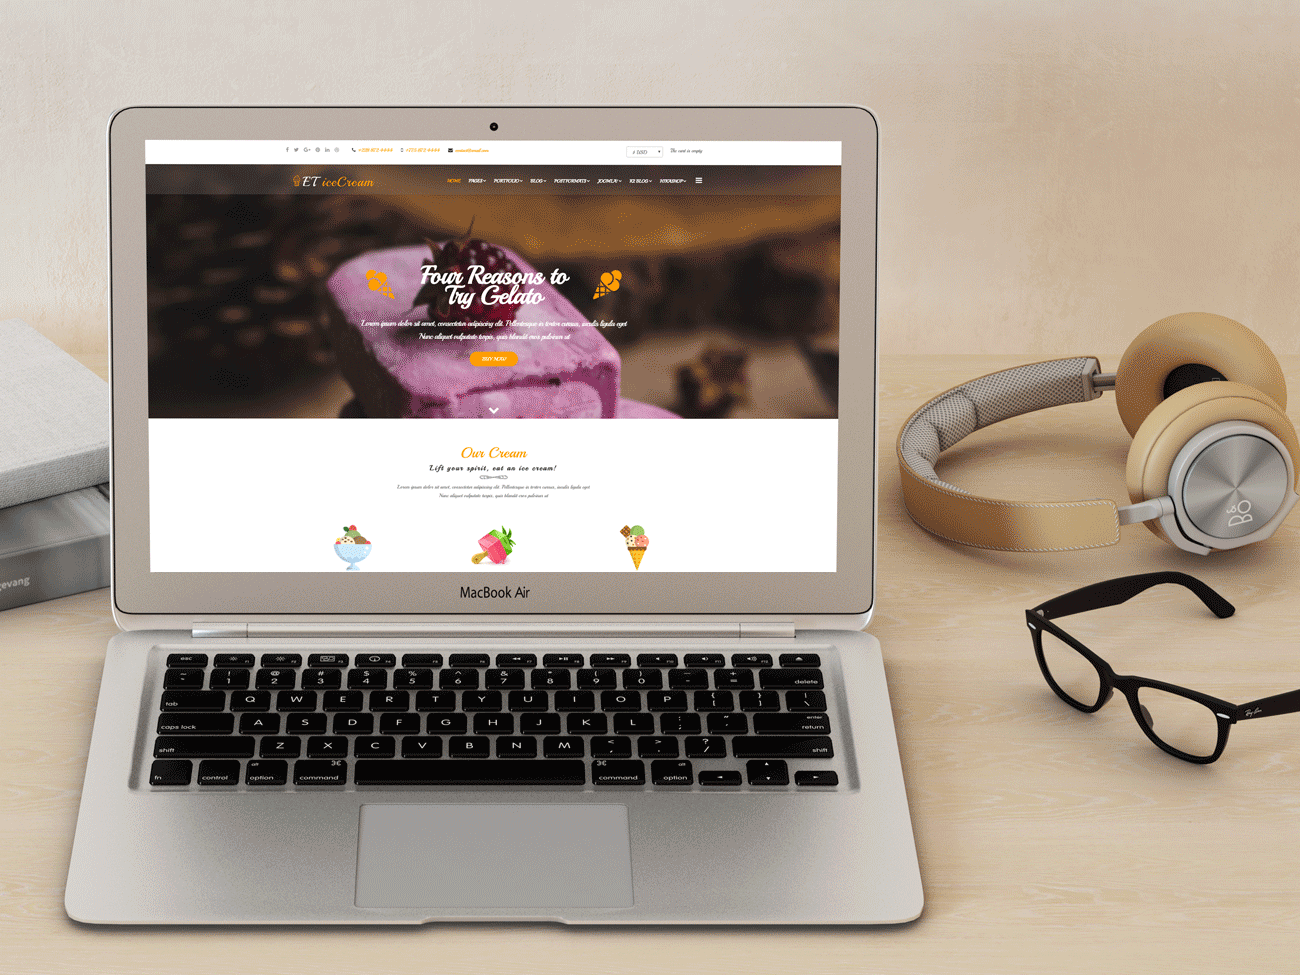 et-icecream-screenshot-free-responsive-joomla-template